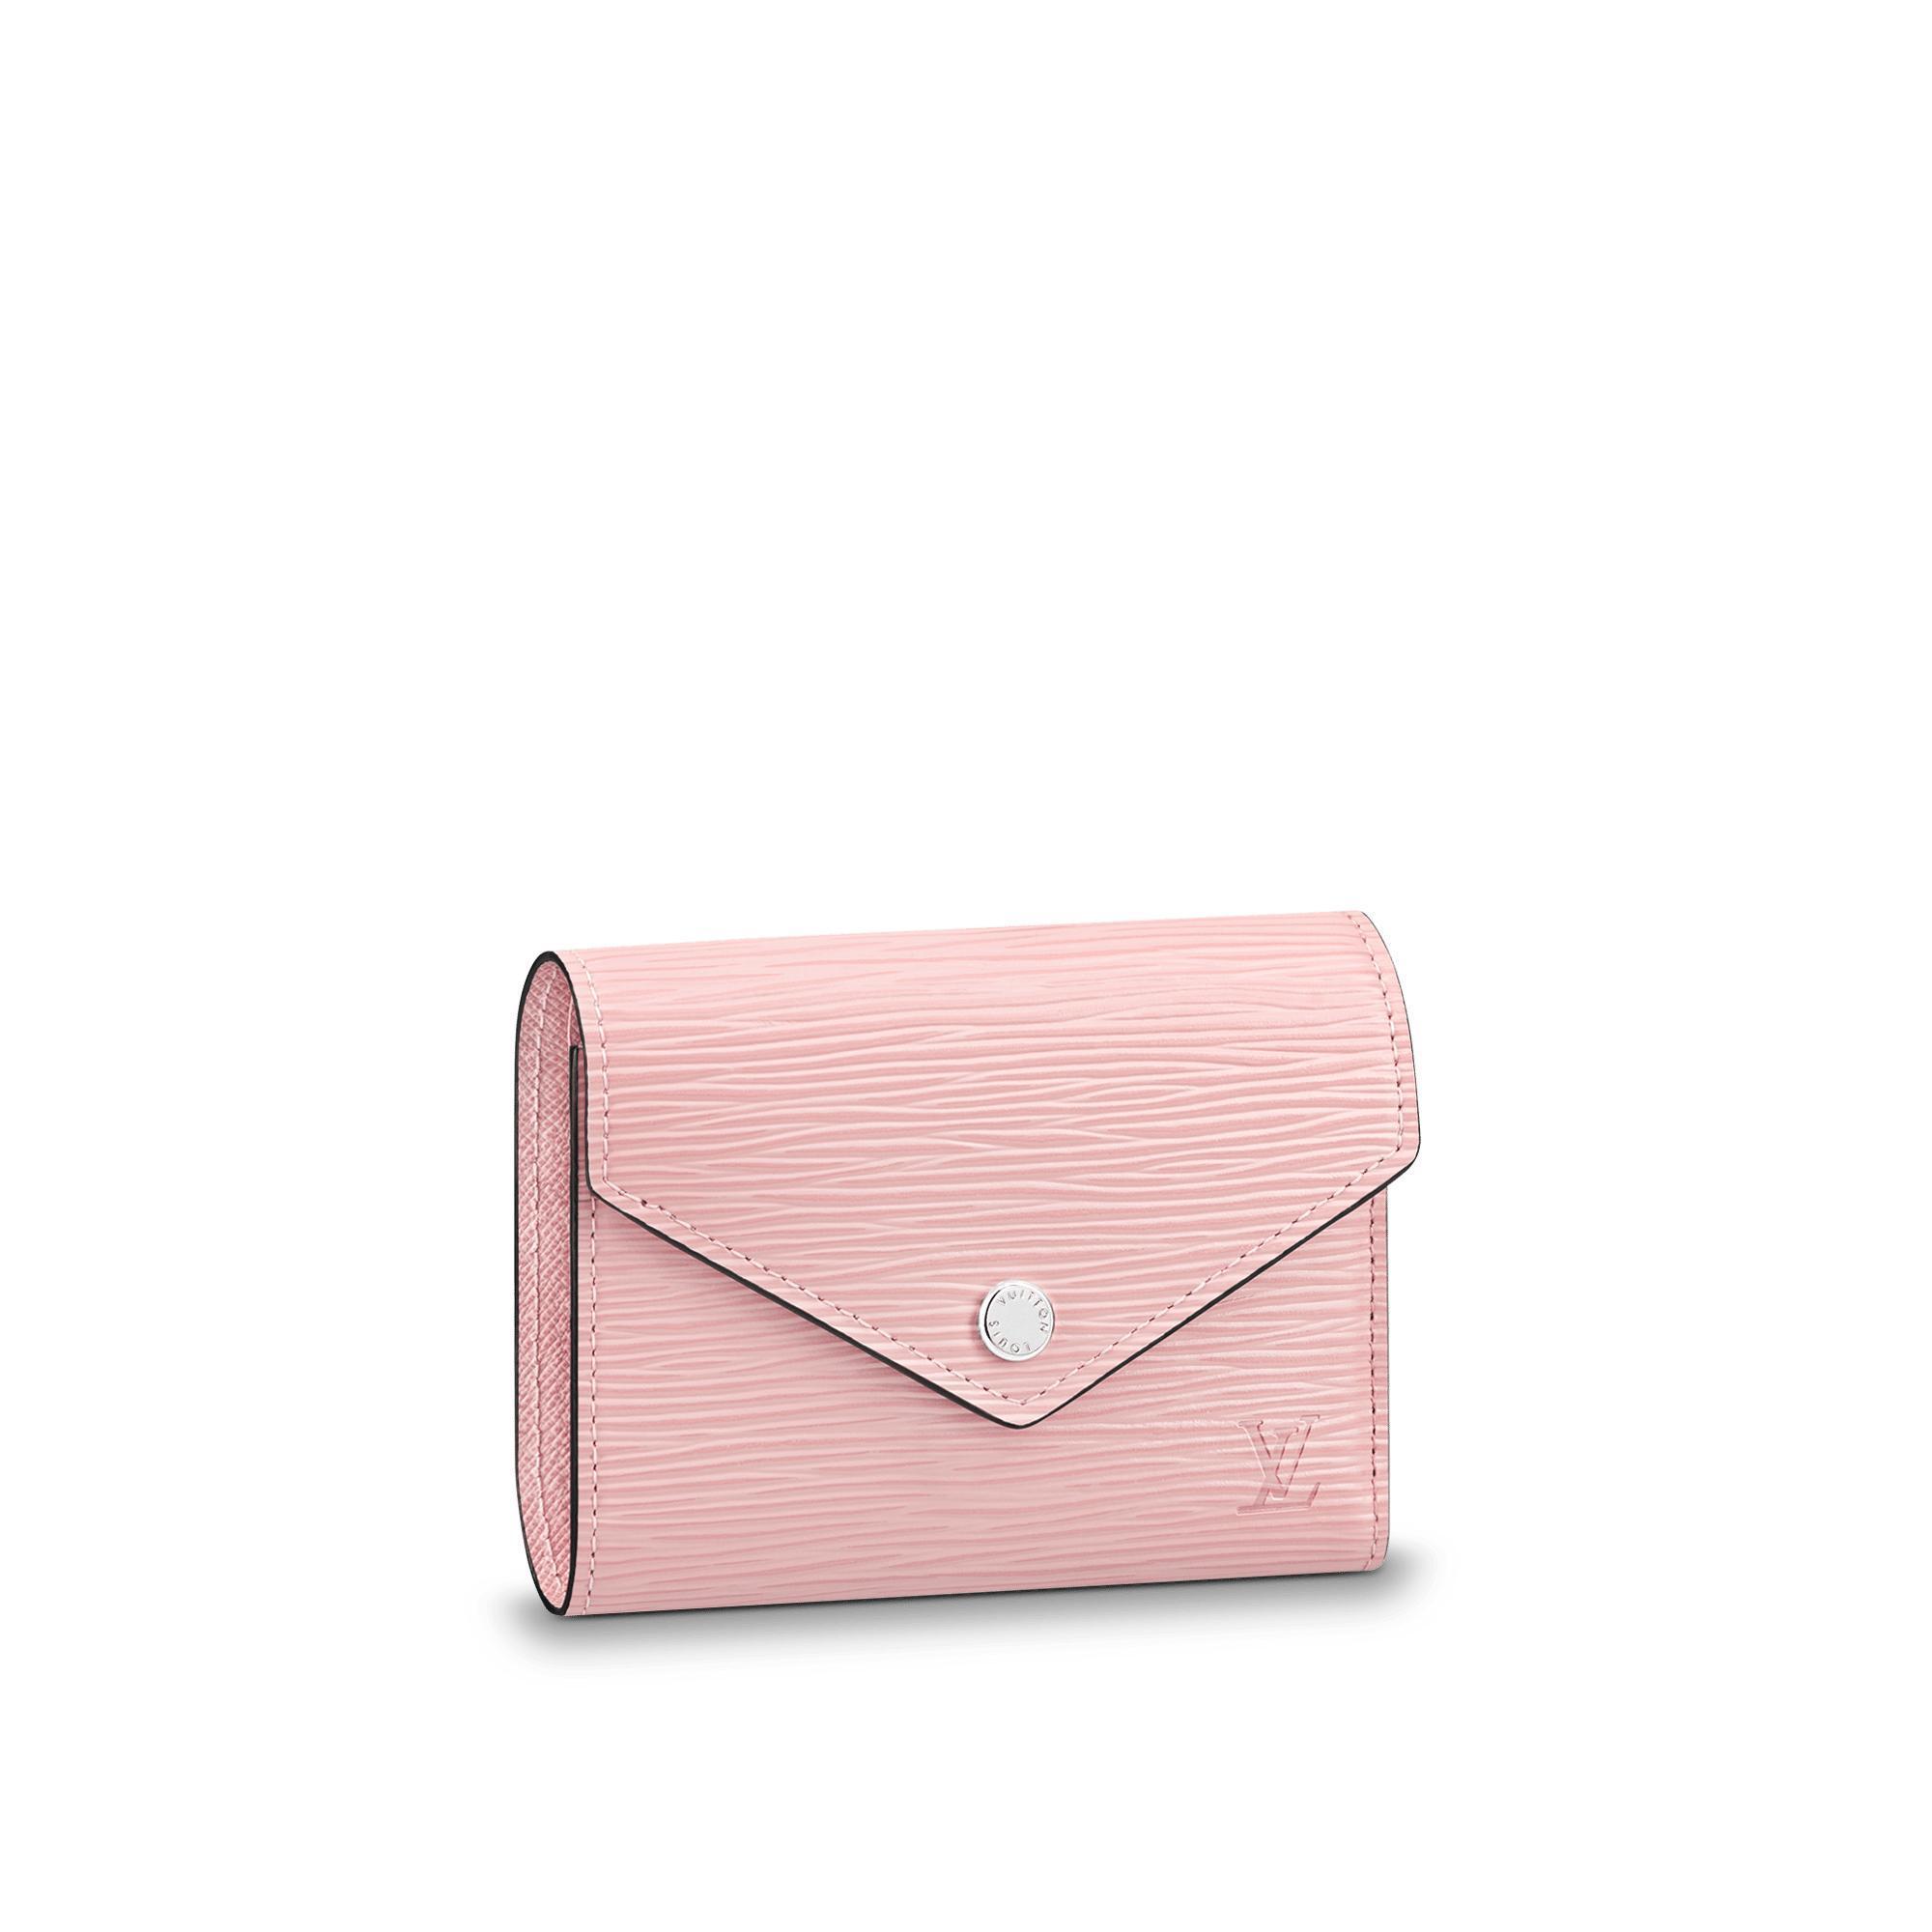 Victorine Wallet in Rose Ballerine